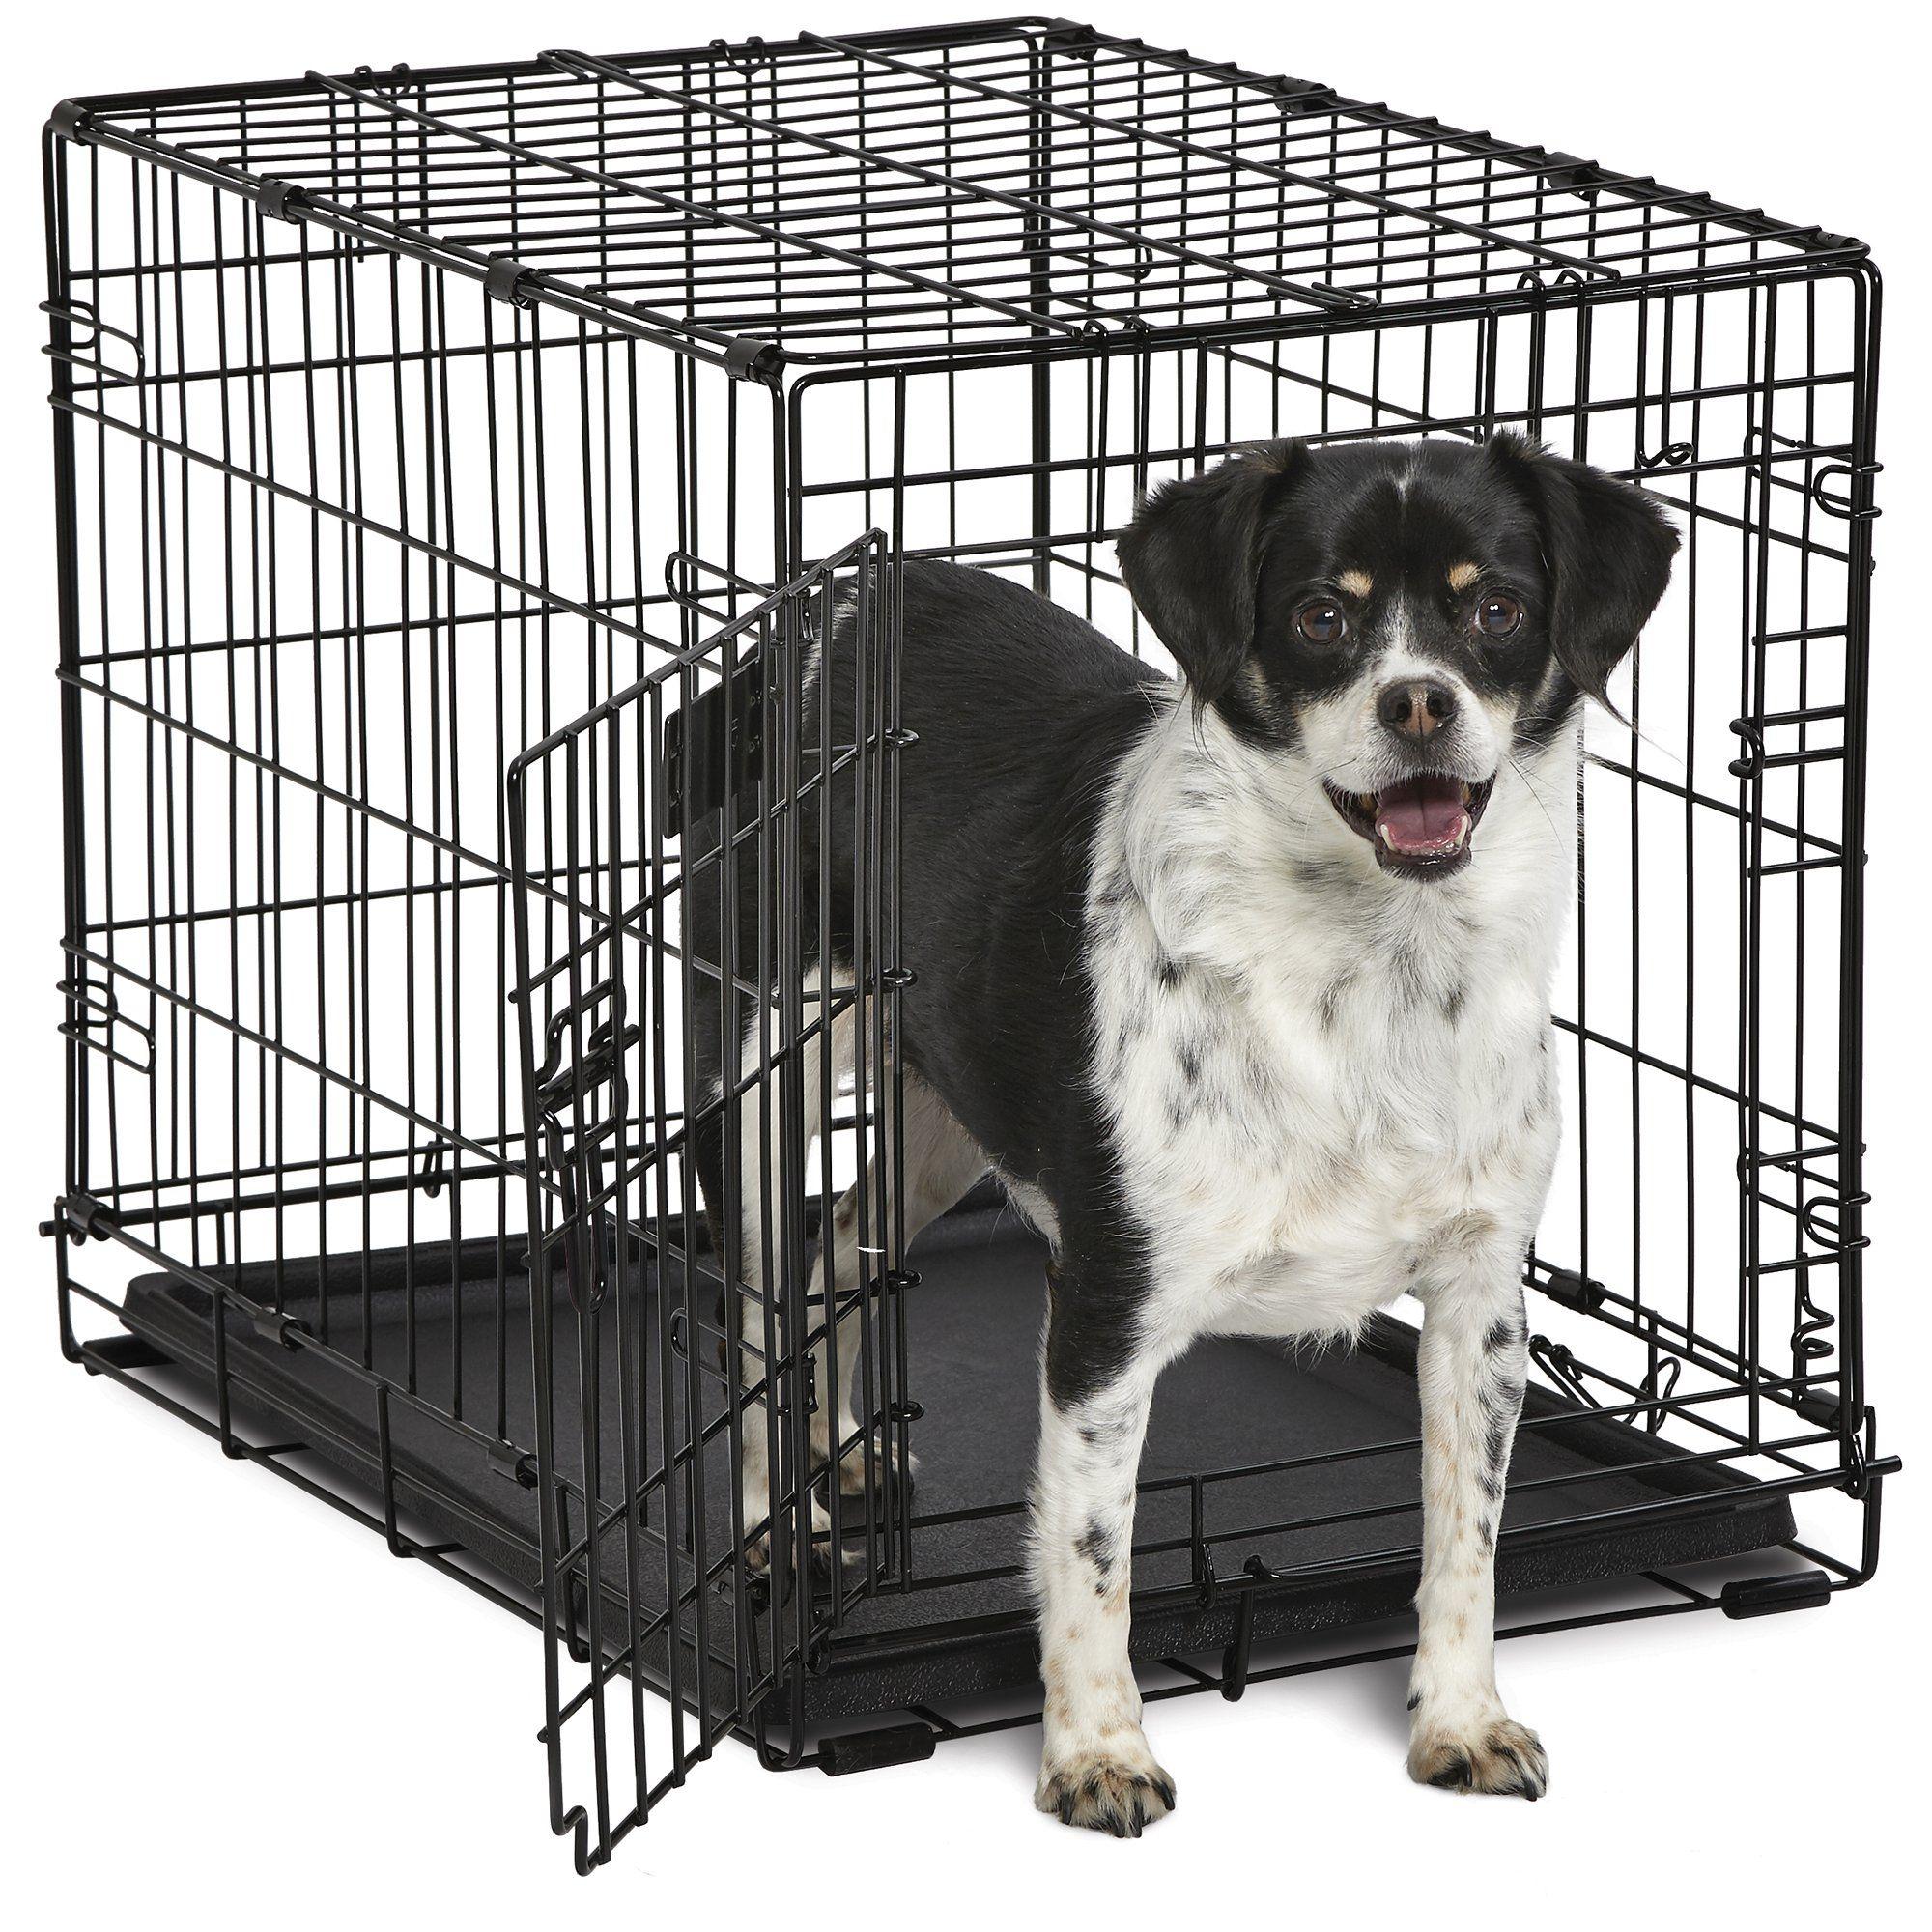 Midwest Contour Folding Dog Crate 25 25 L X 17 5 W X 19 5 H